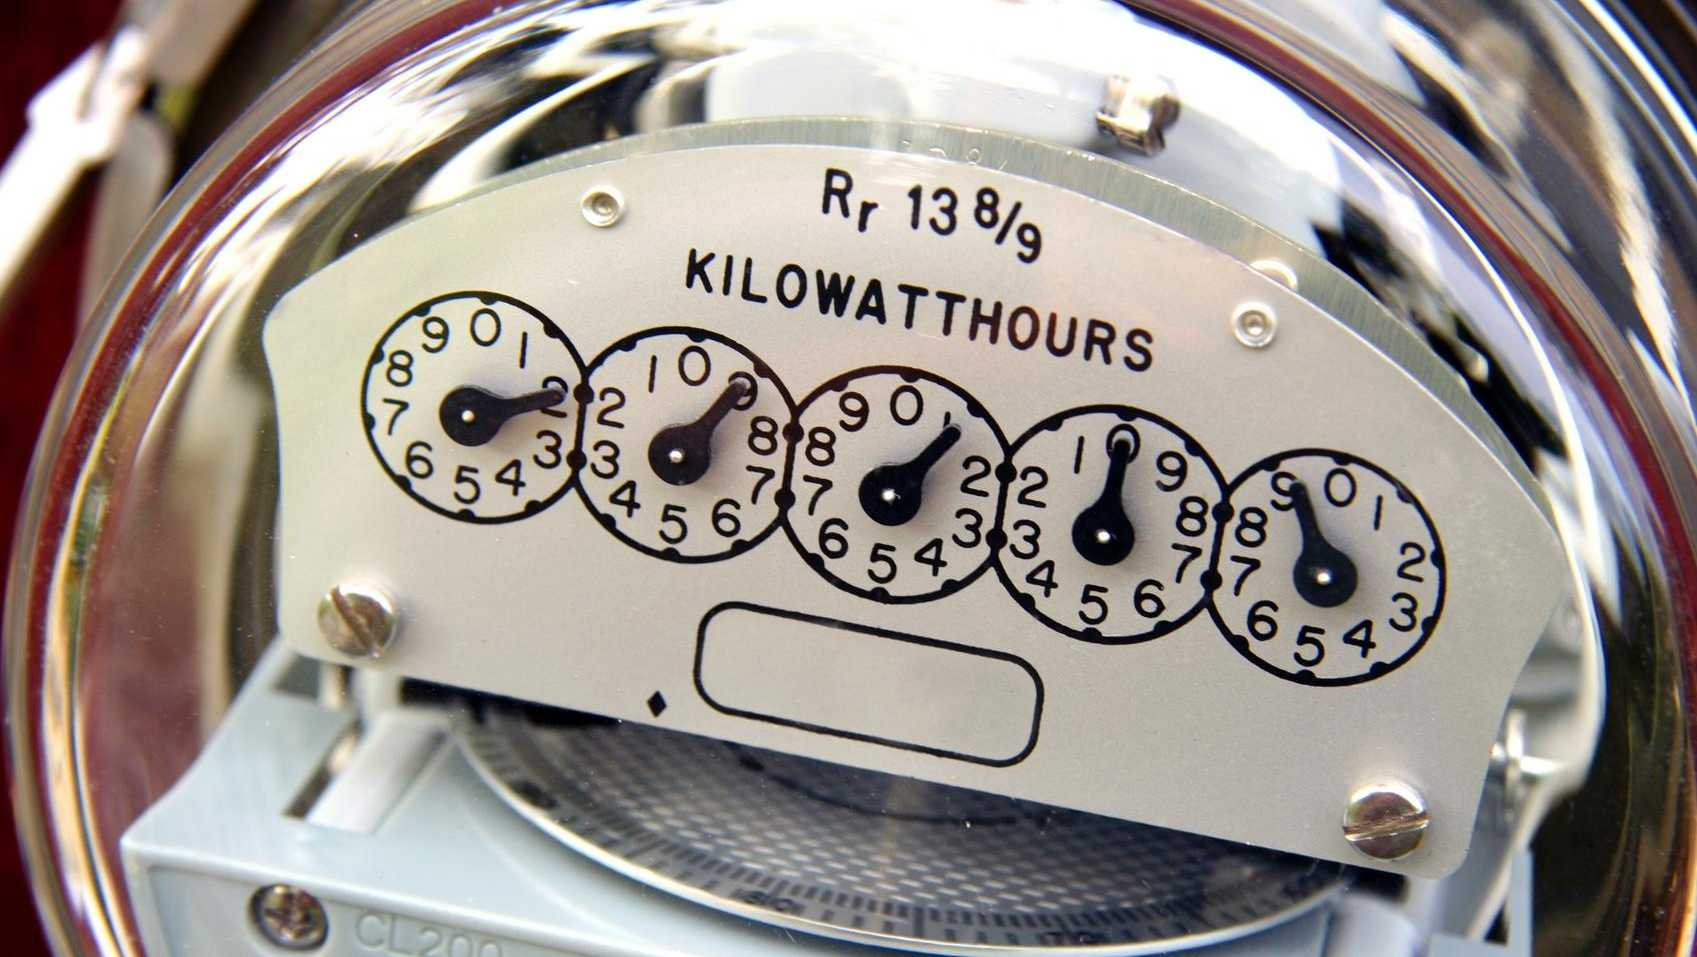 Electric meter - 27586345